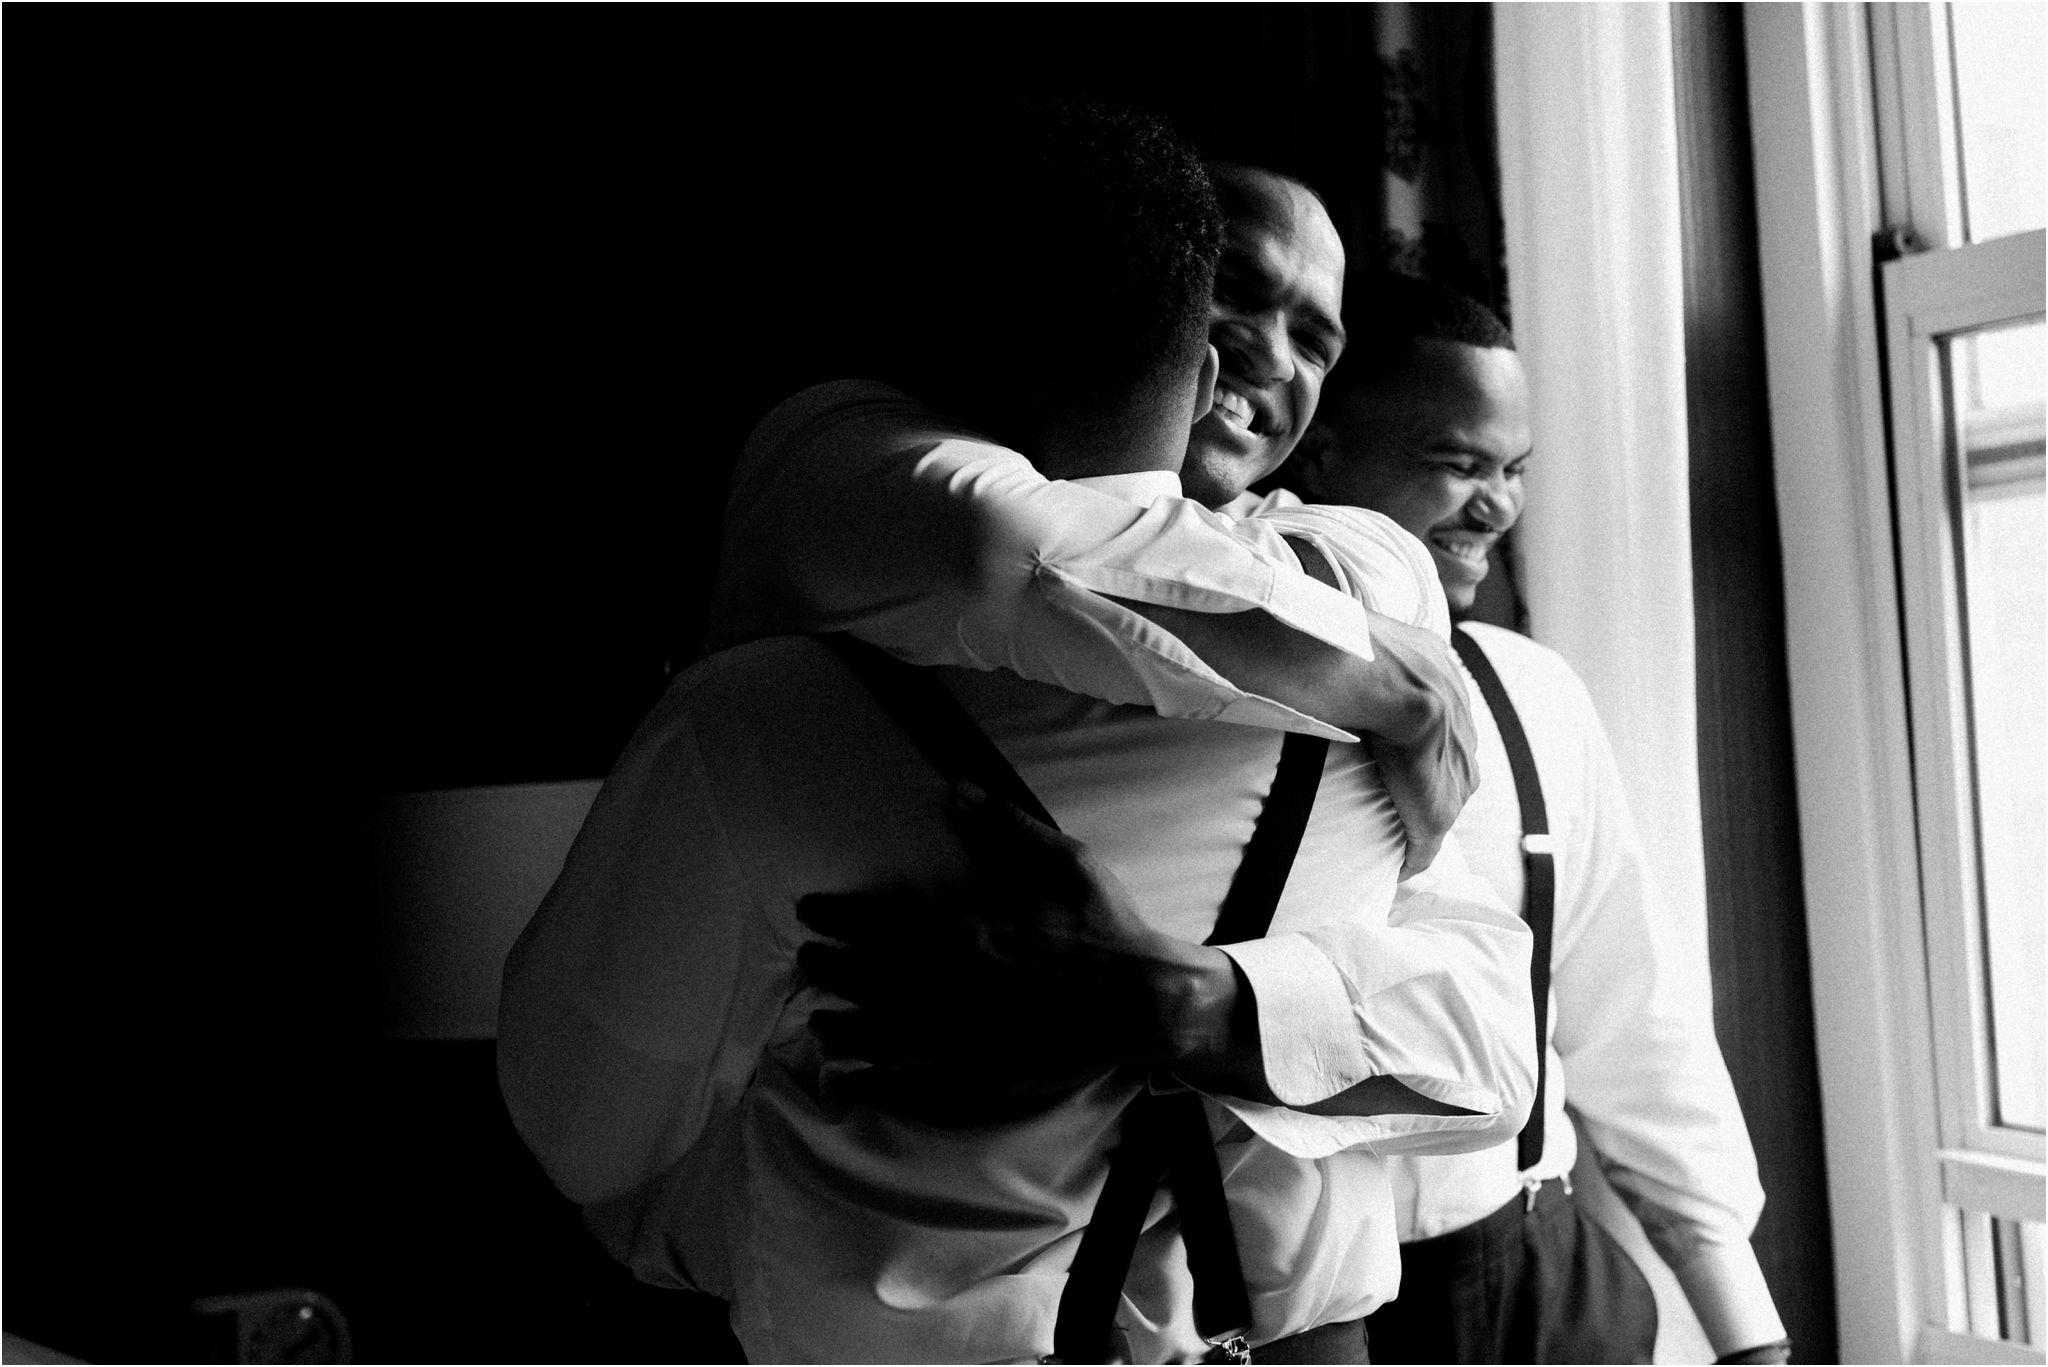 providence-public-library-wedding-images_00010.JPG